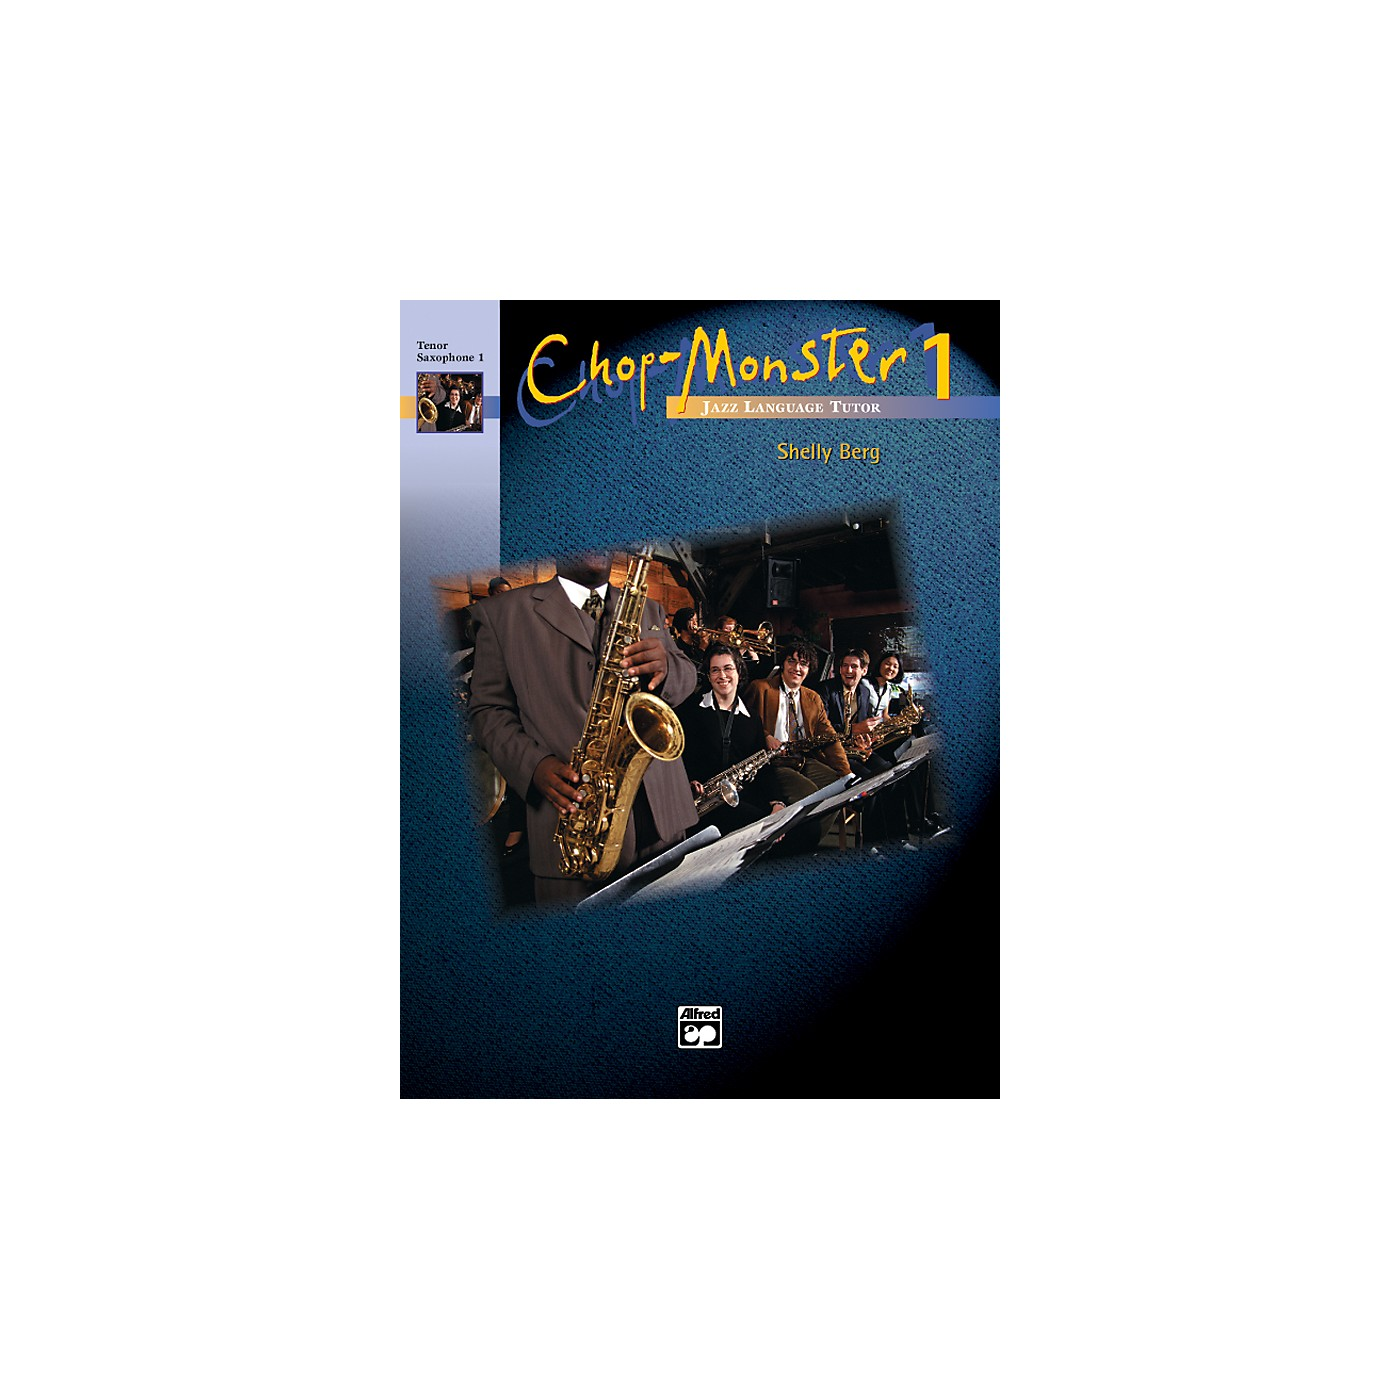 Alfred Chop-Monster Book 1 Trumpet 4 Book thumbnail